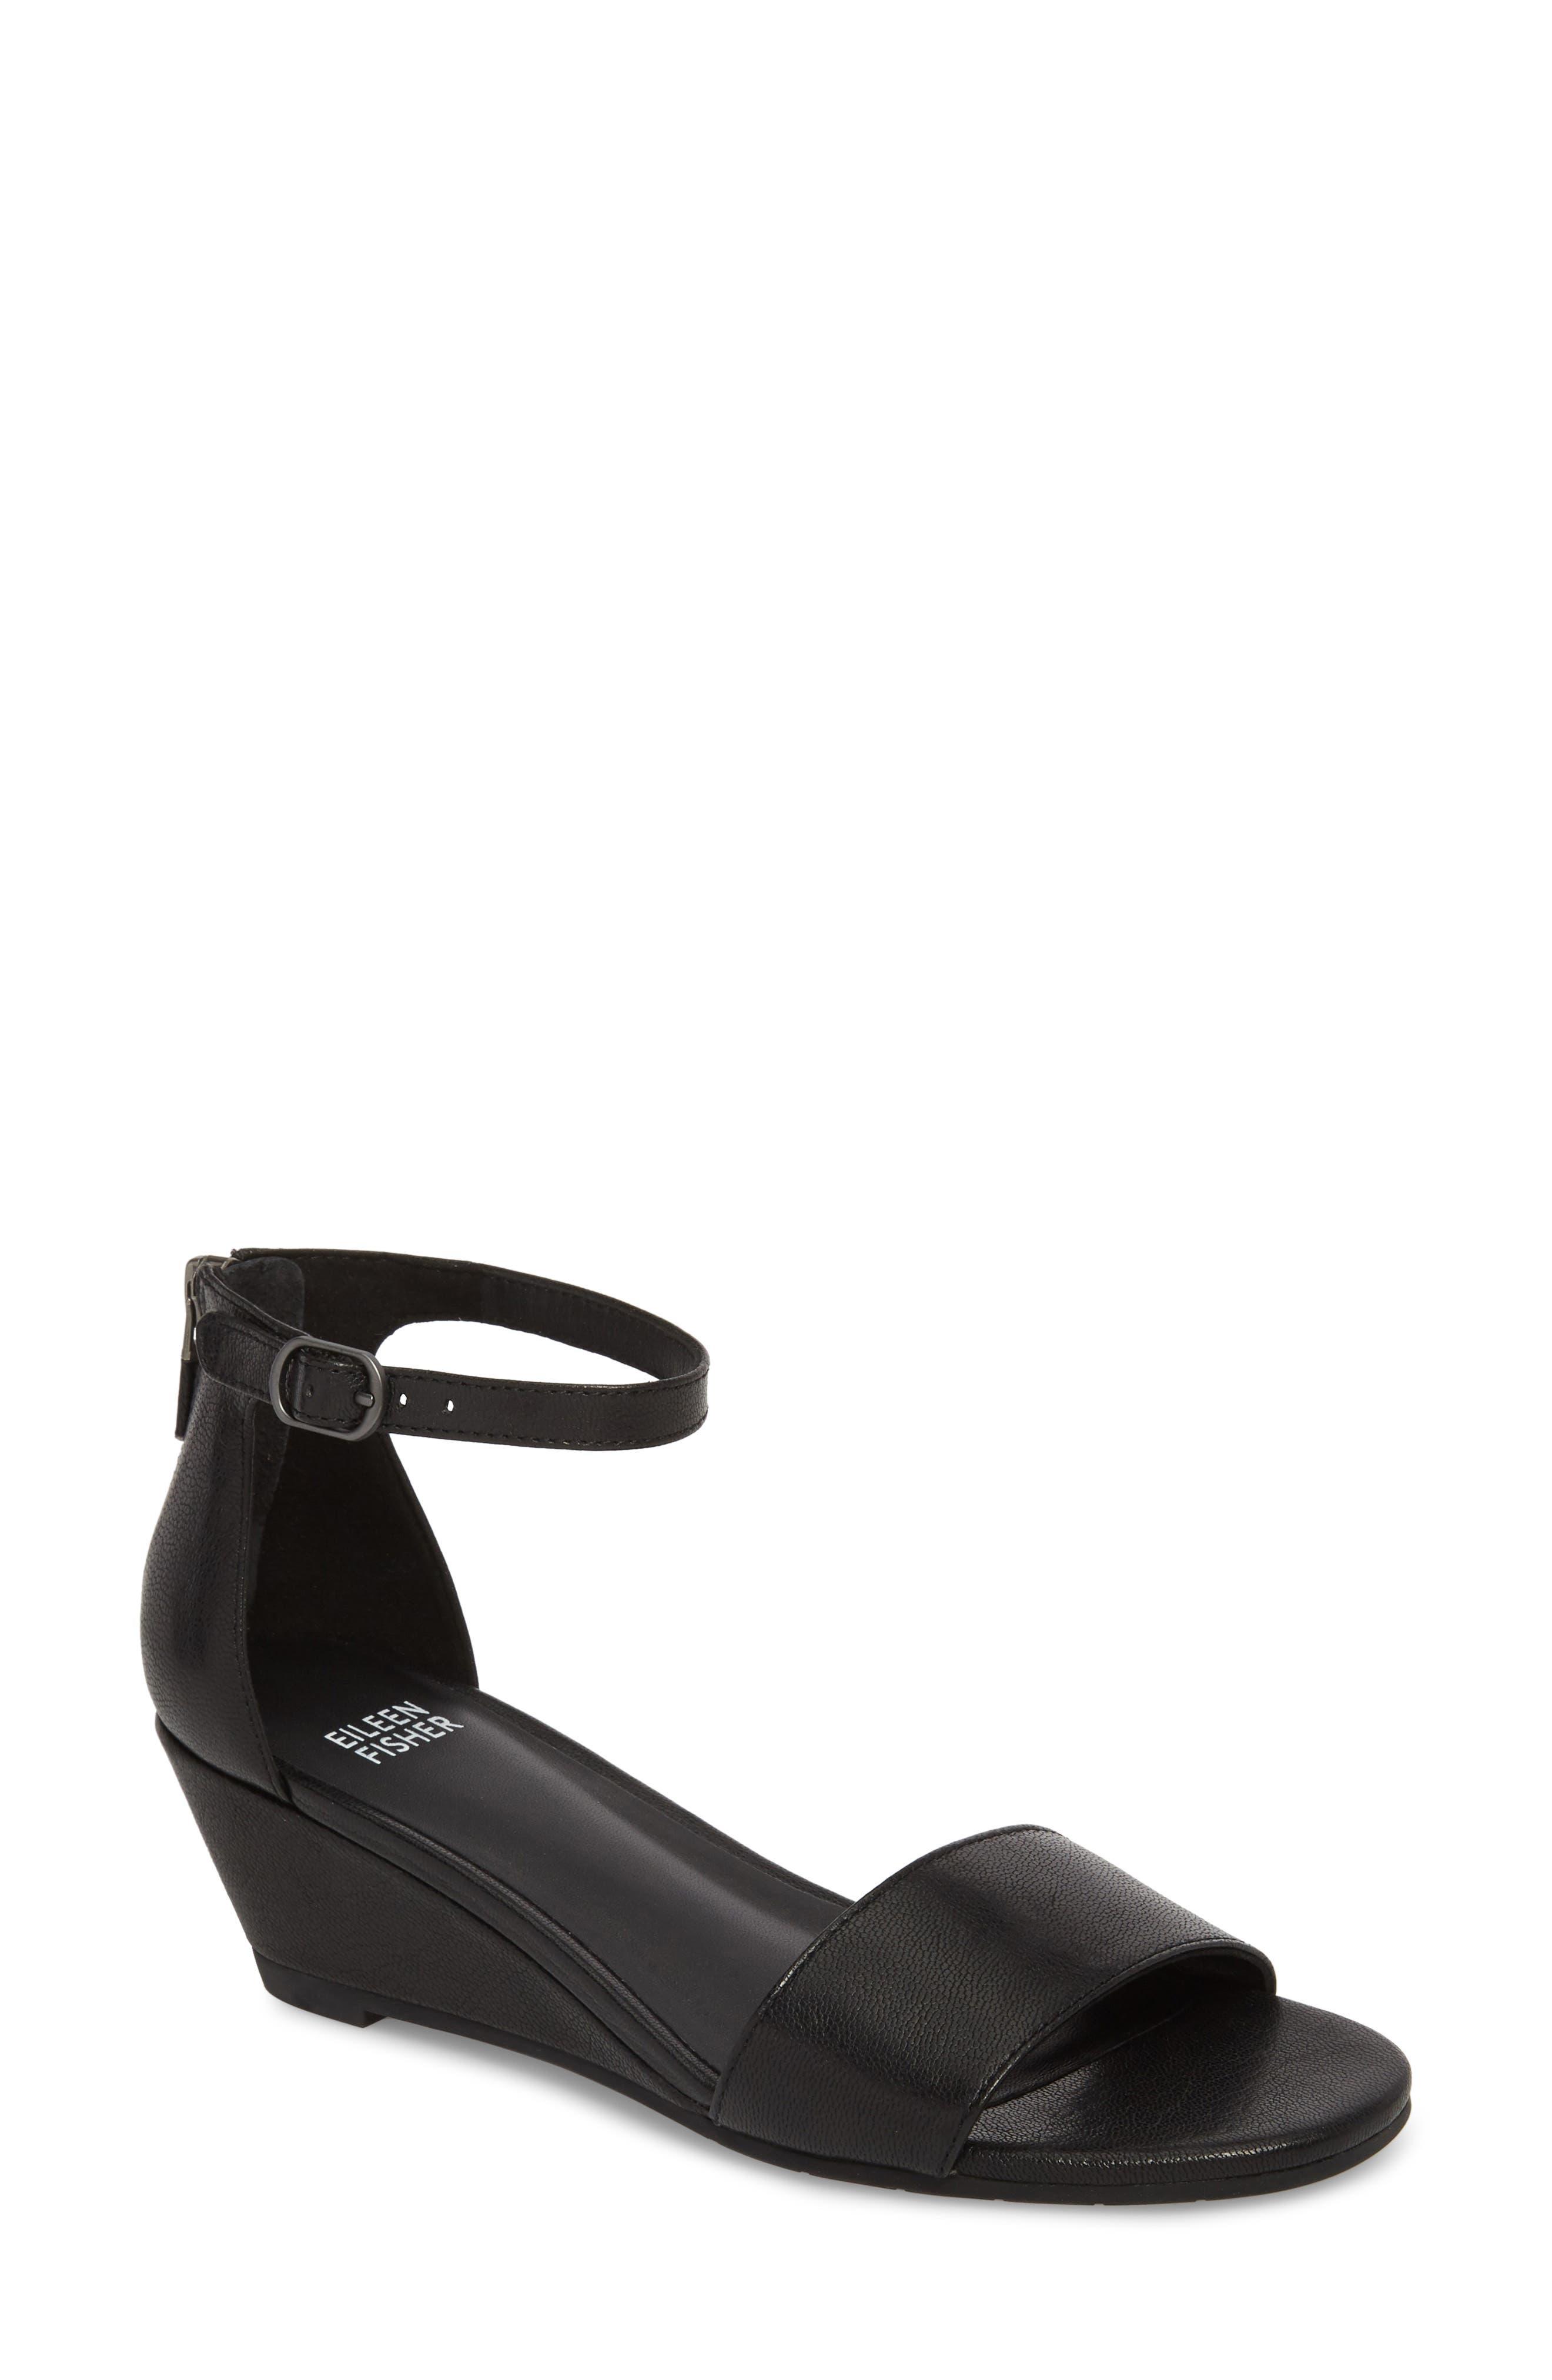 Mara Ankle Strap Wedge Sandal,                         Main,                         color, 001